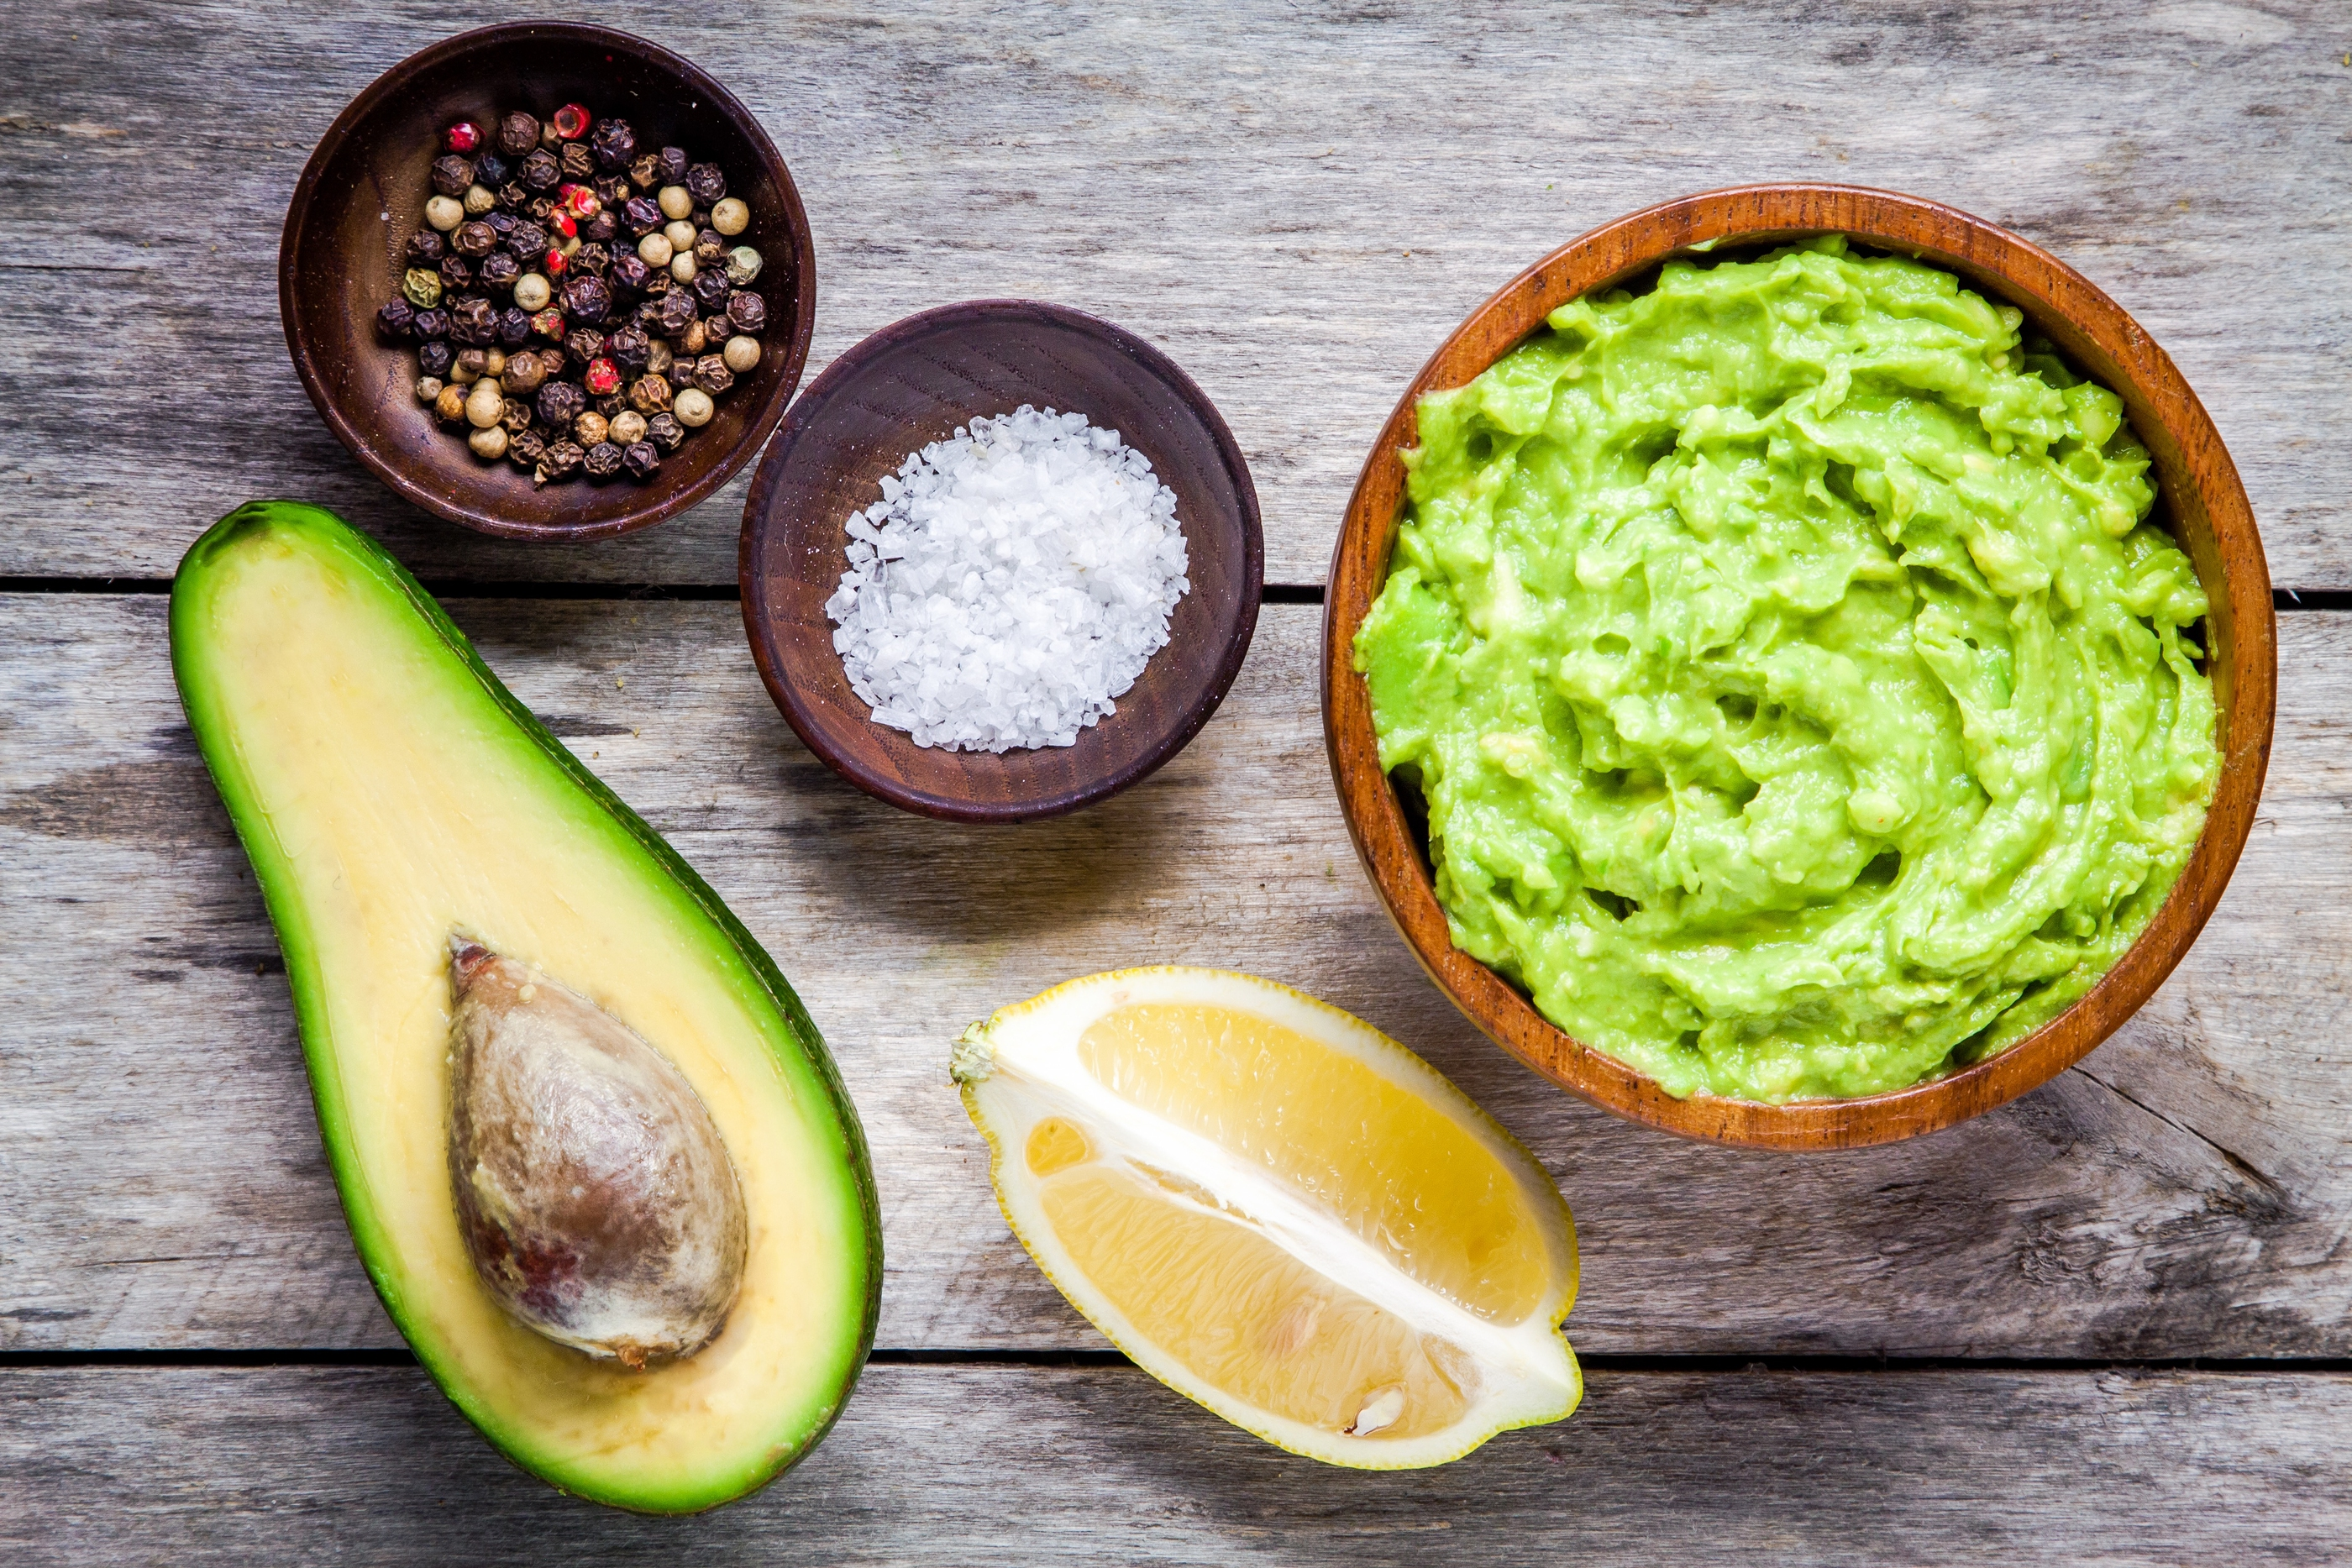 Ingredients For Homemade Guacamole_ Avocado, Lemon, Salt And Pepper.jpg